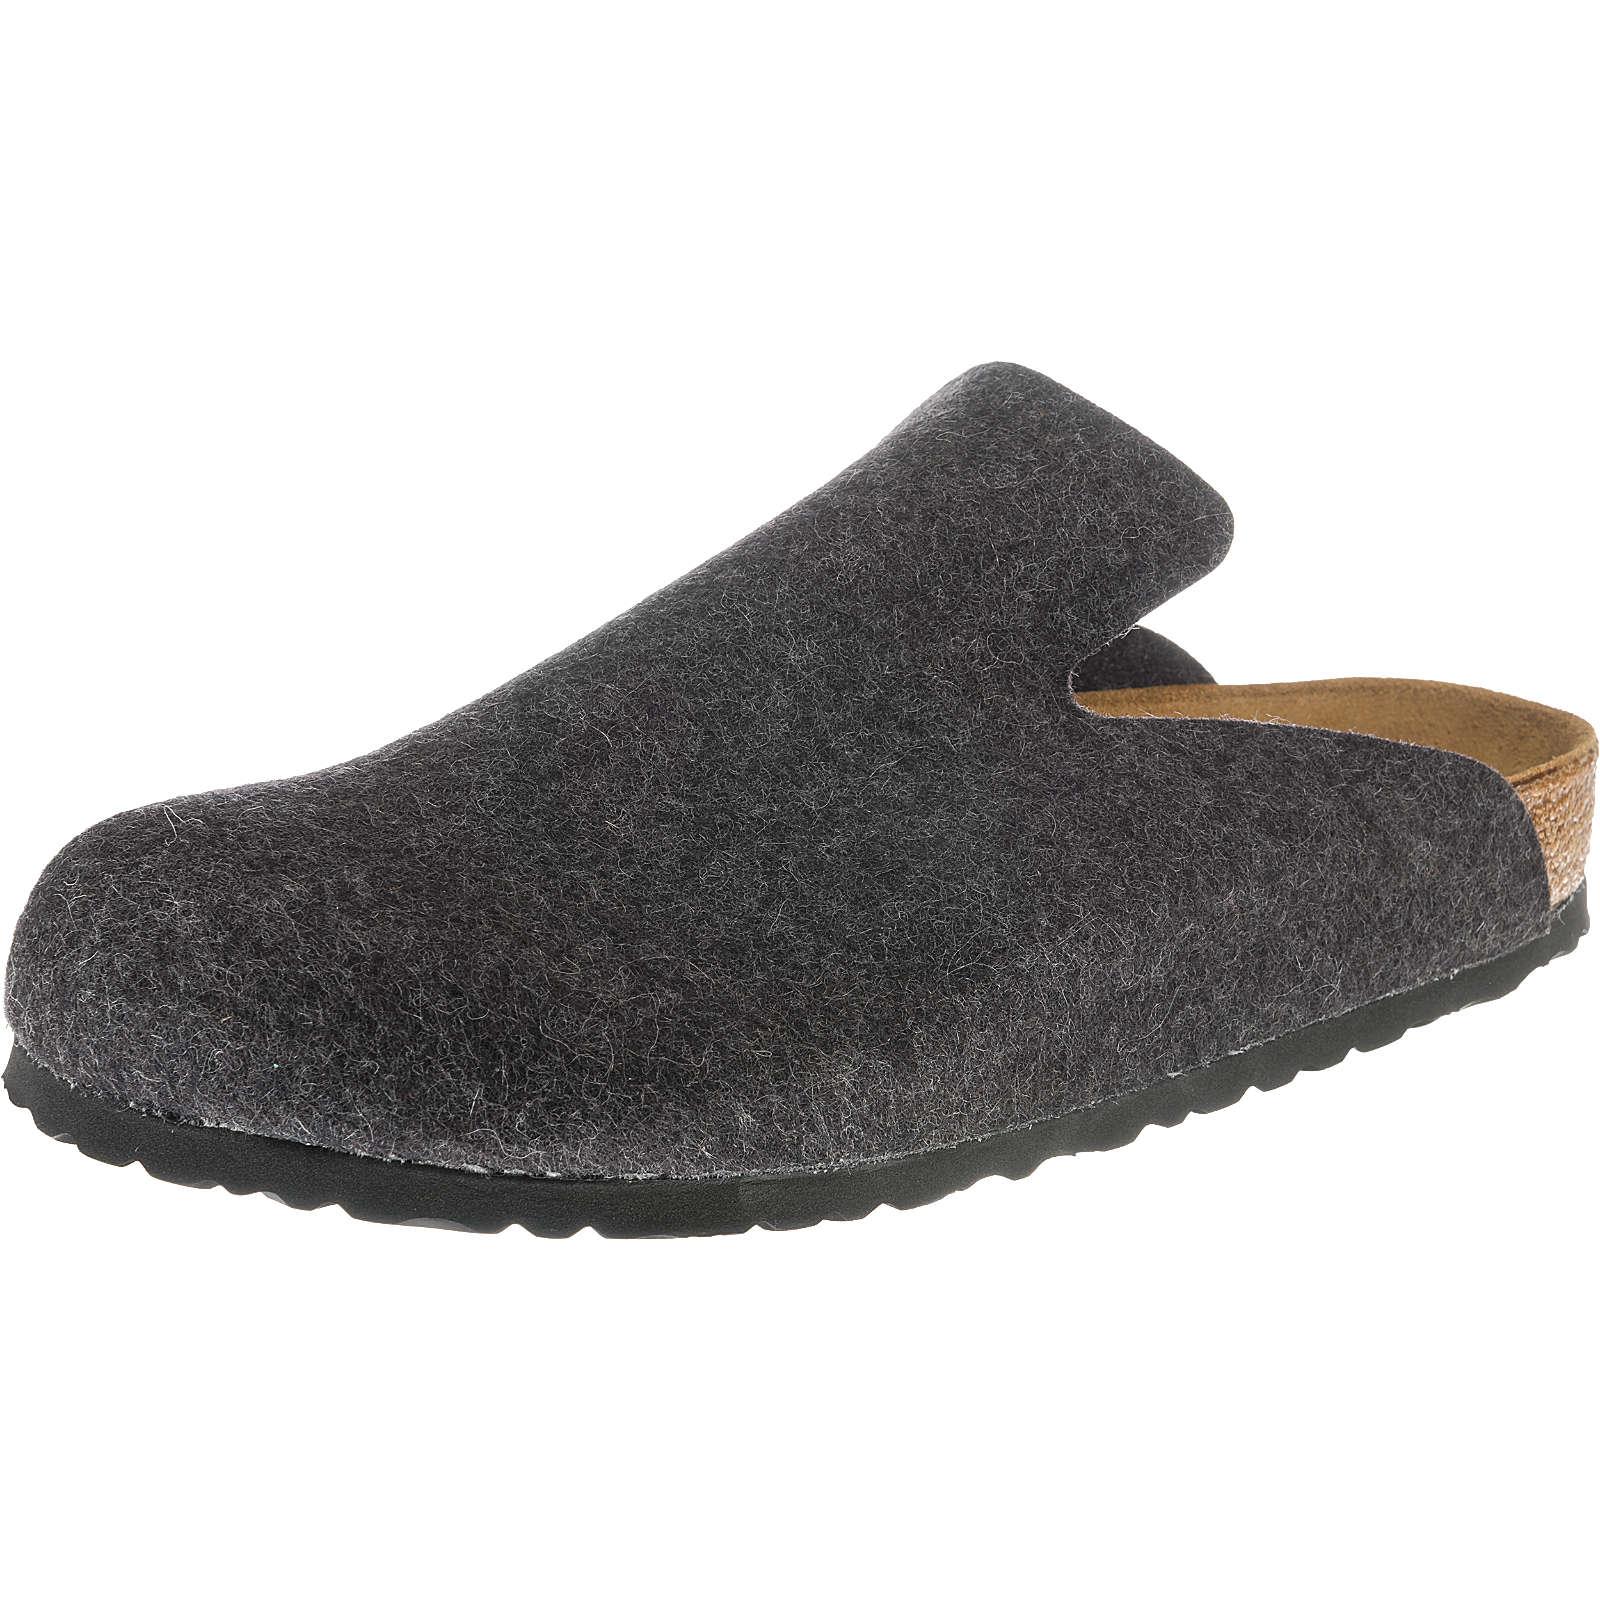 BIRKENSTOCK Davos Pantoffeln anthrazit Herren Gr. 46